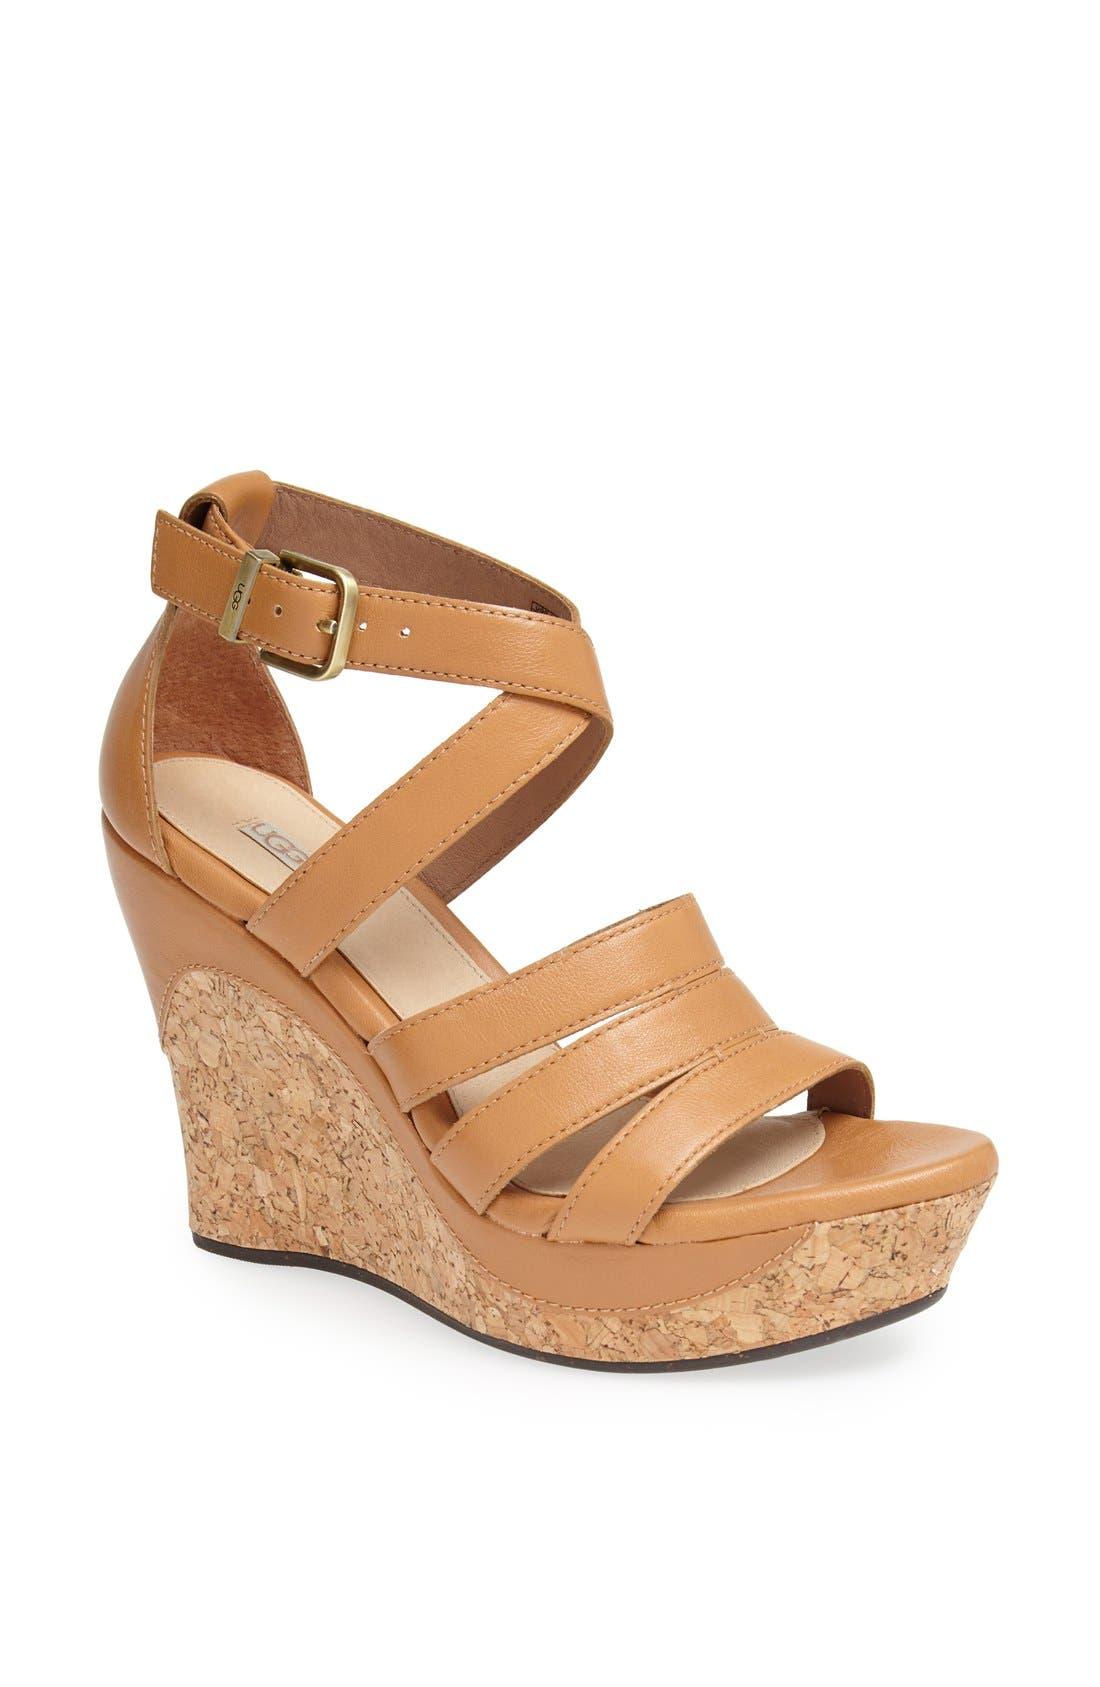 Main Image - UGG® Australia 'Dillion' Wedge Sandal